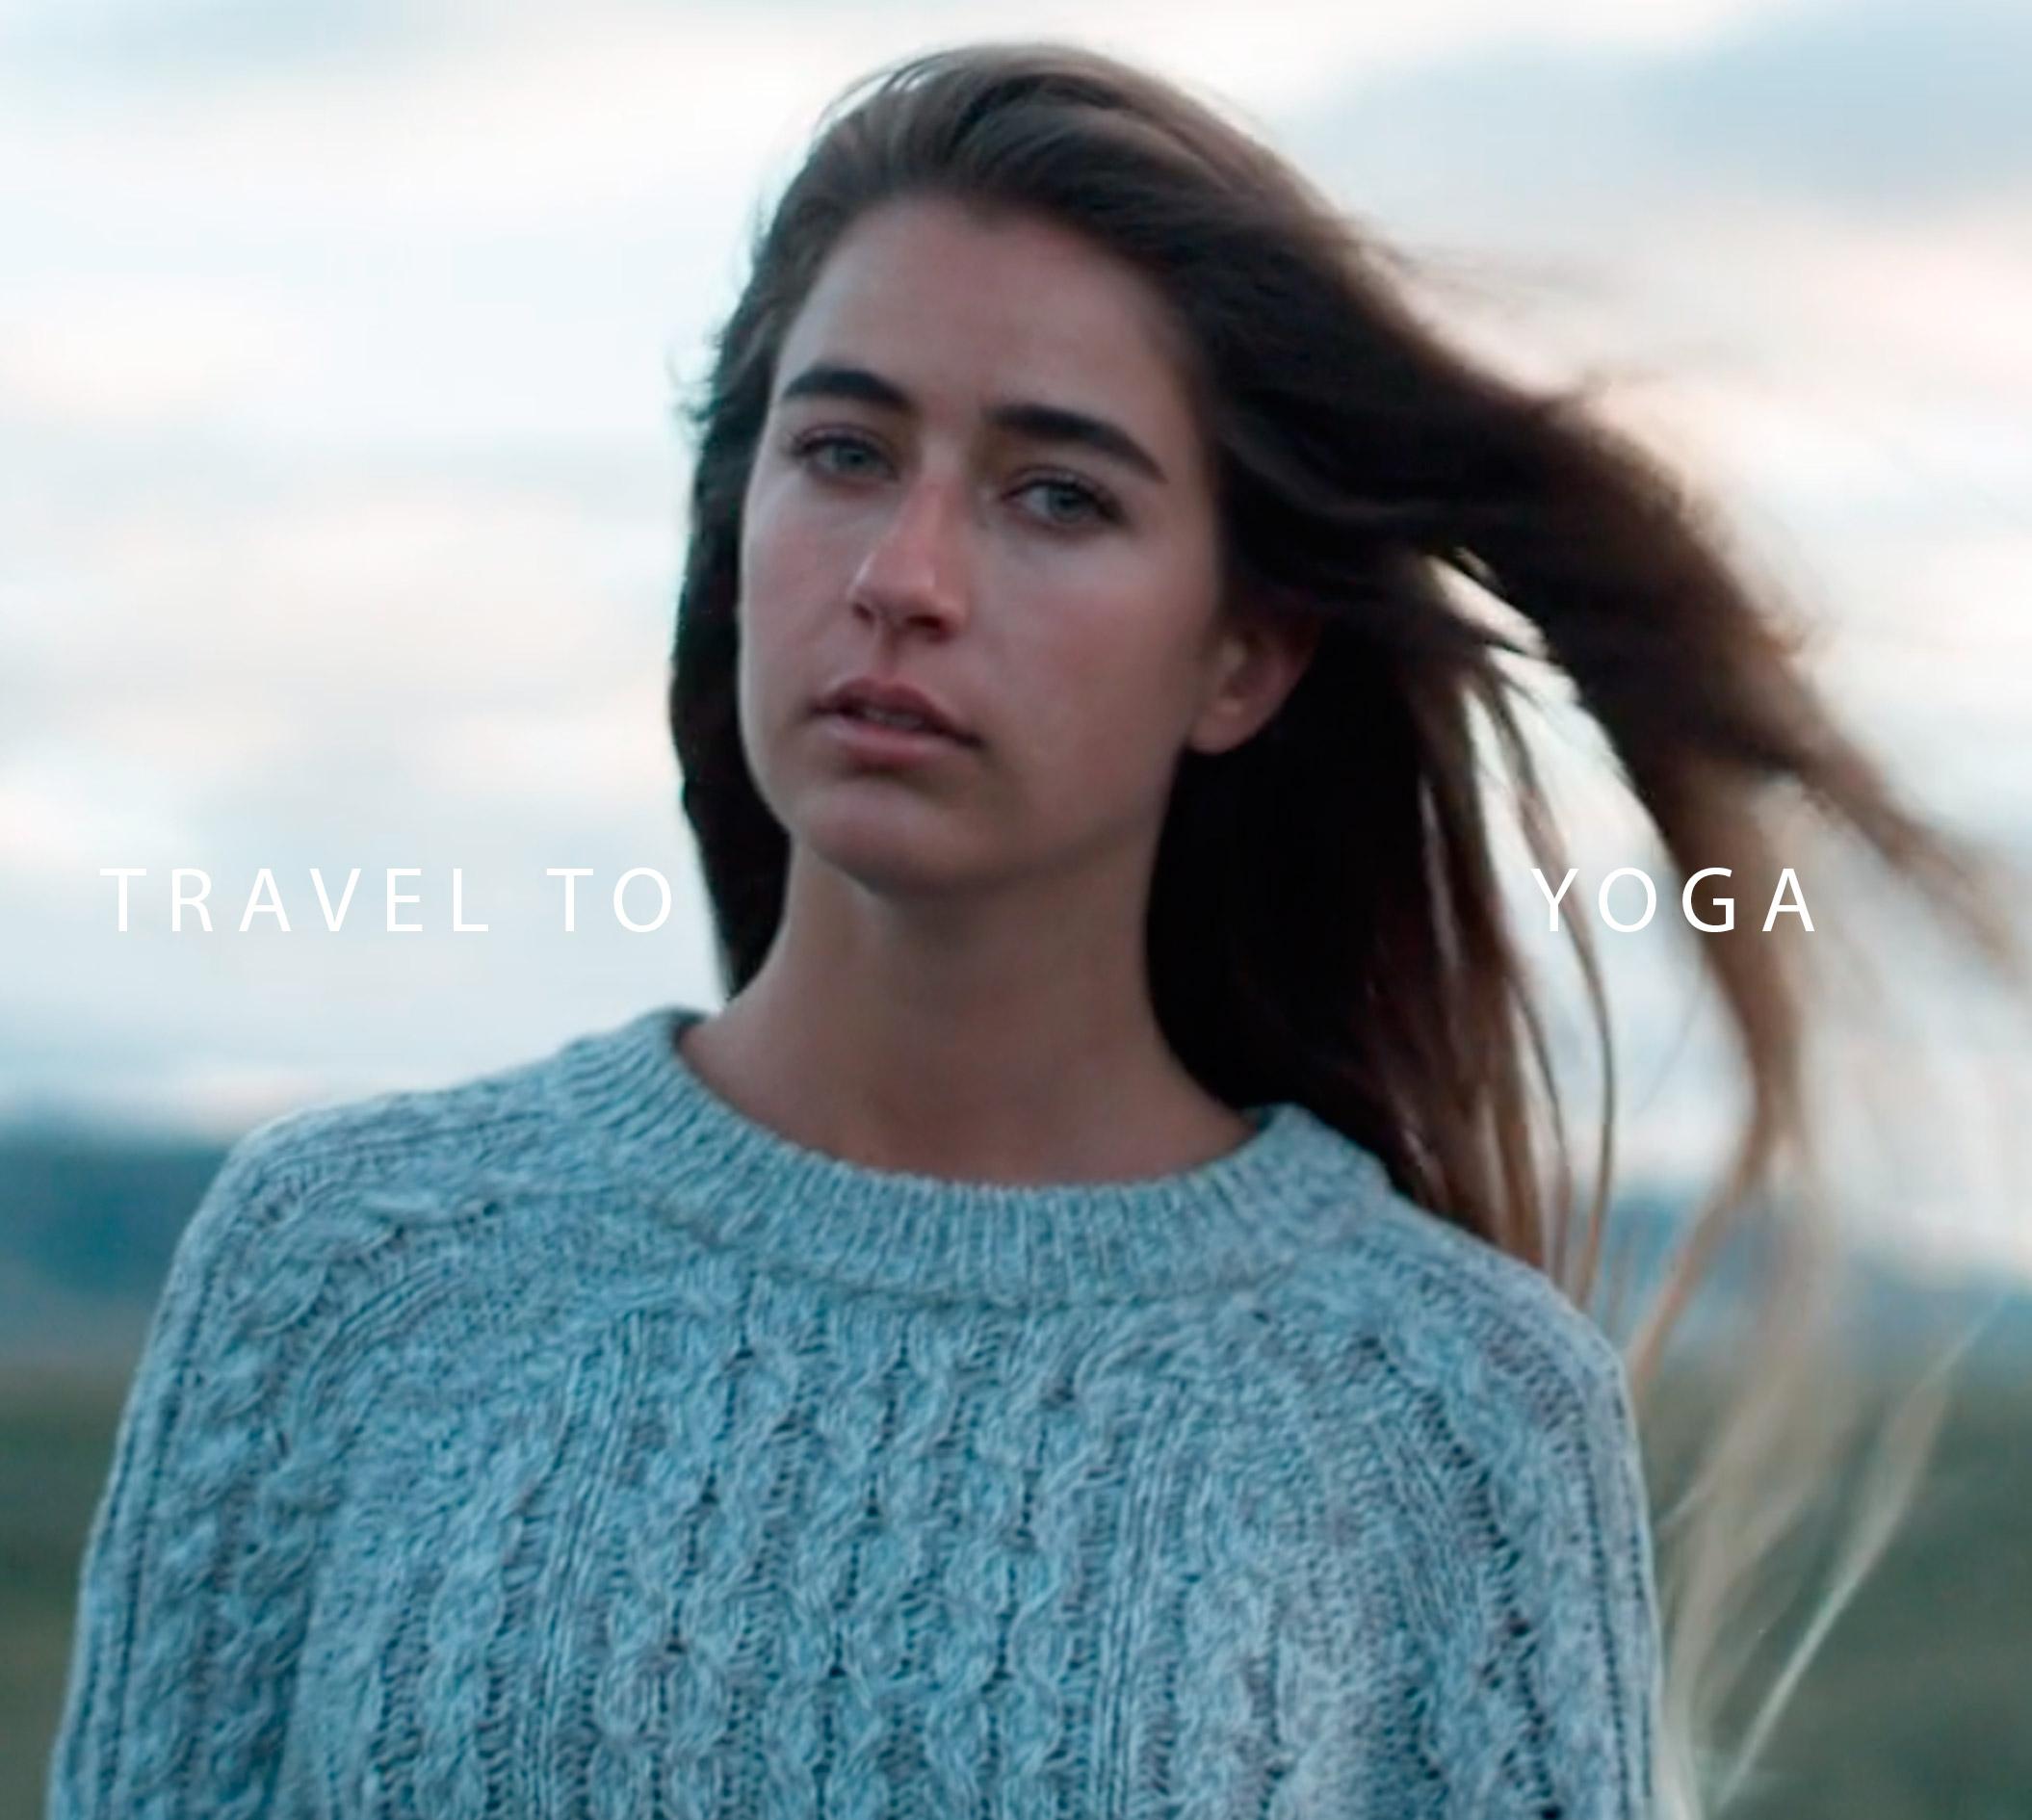 TRAVEL TO YOGA